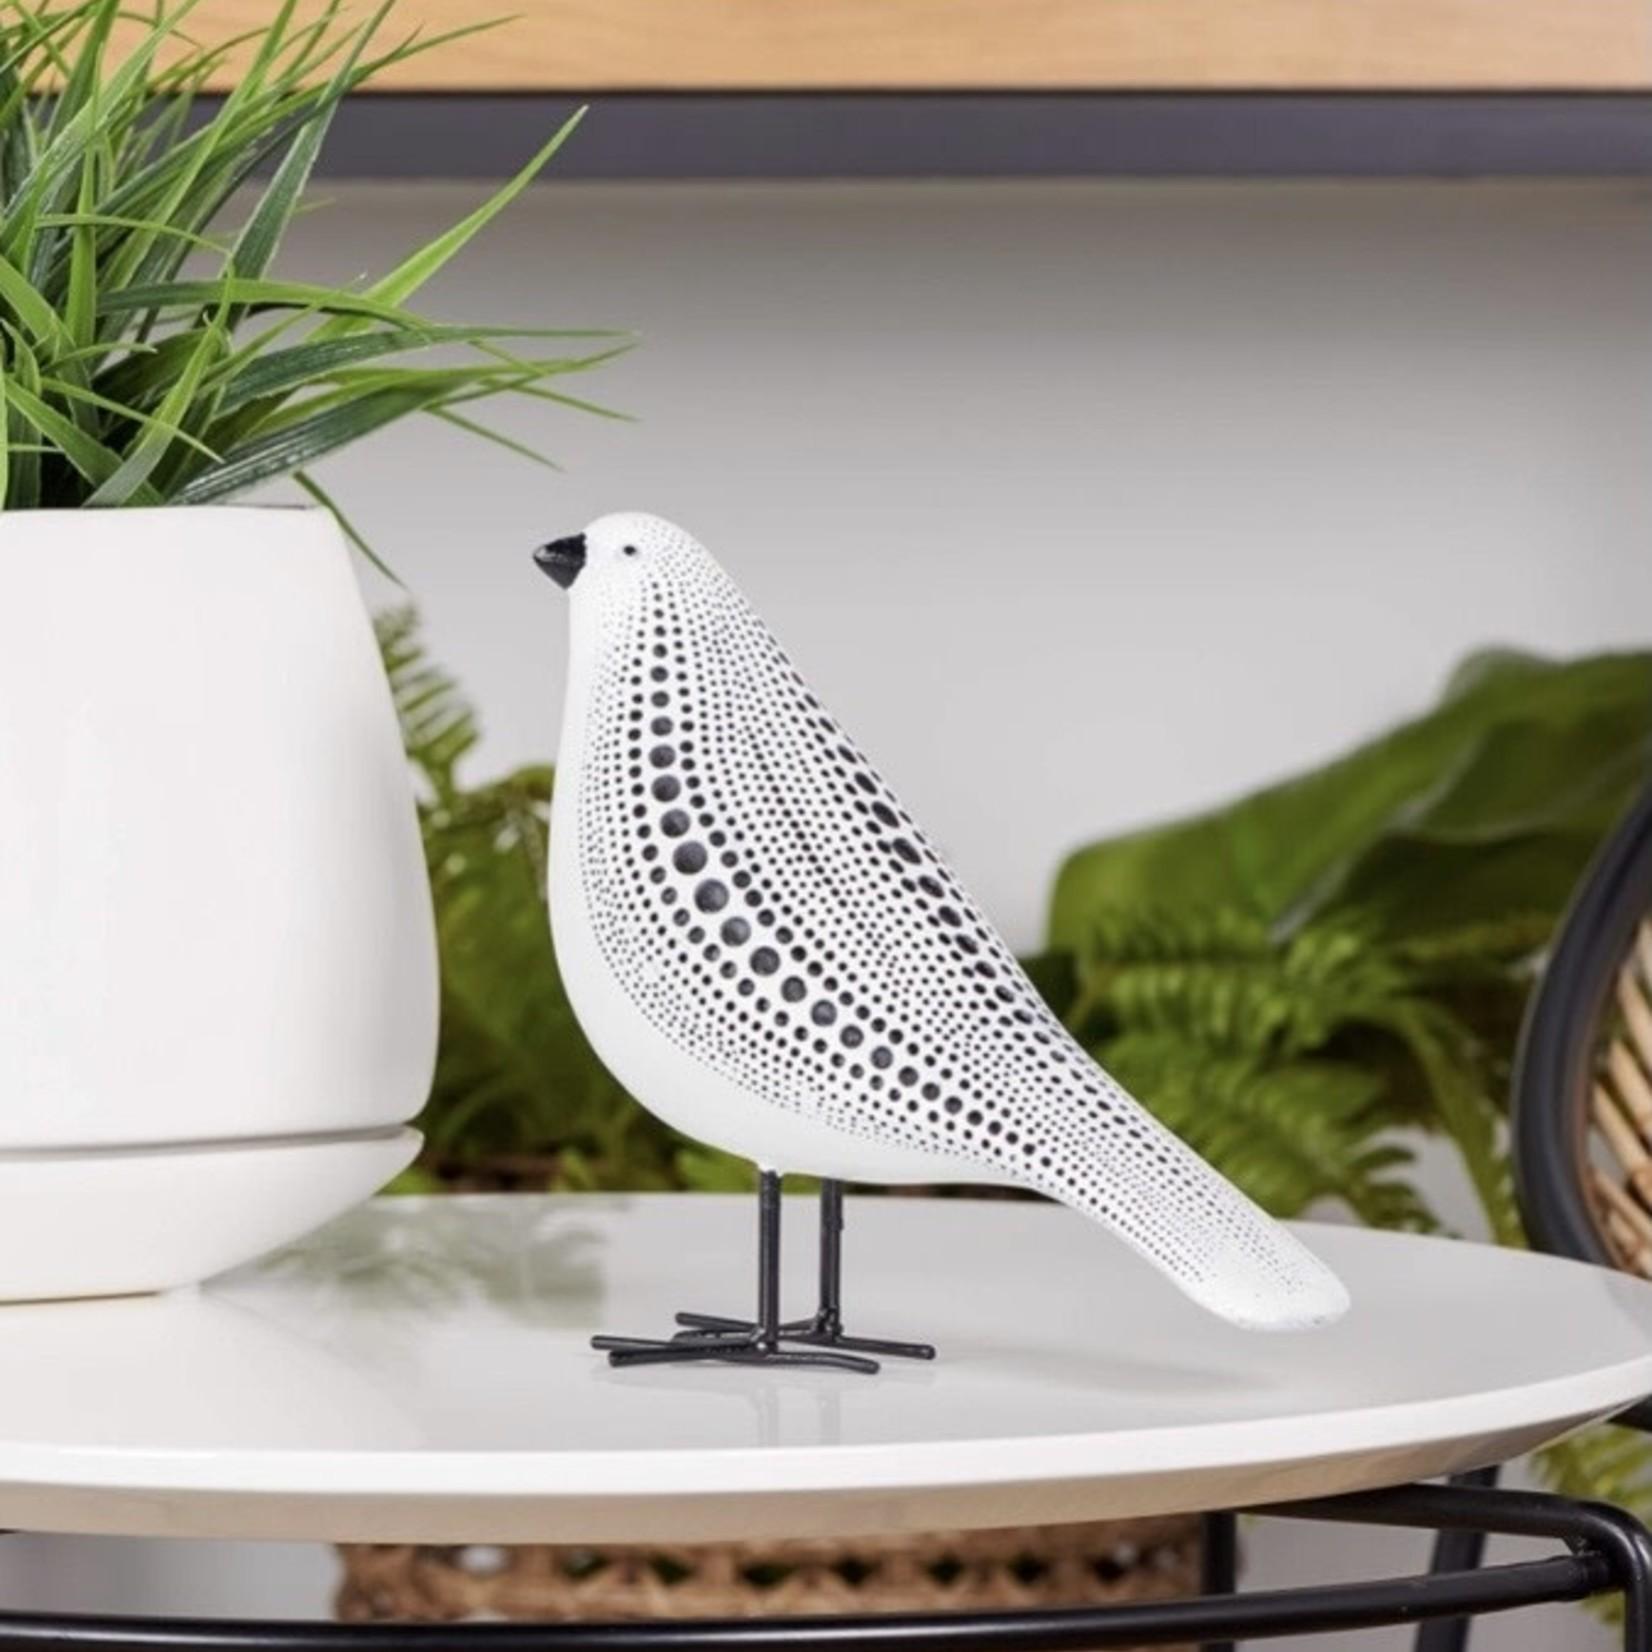 Torre & Tagus Debossed Dotted Standing  Bird